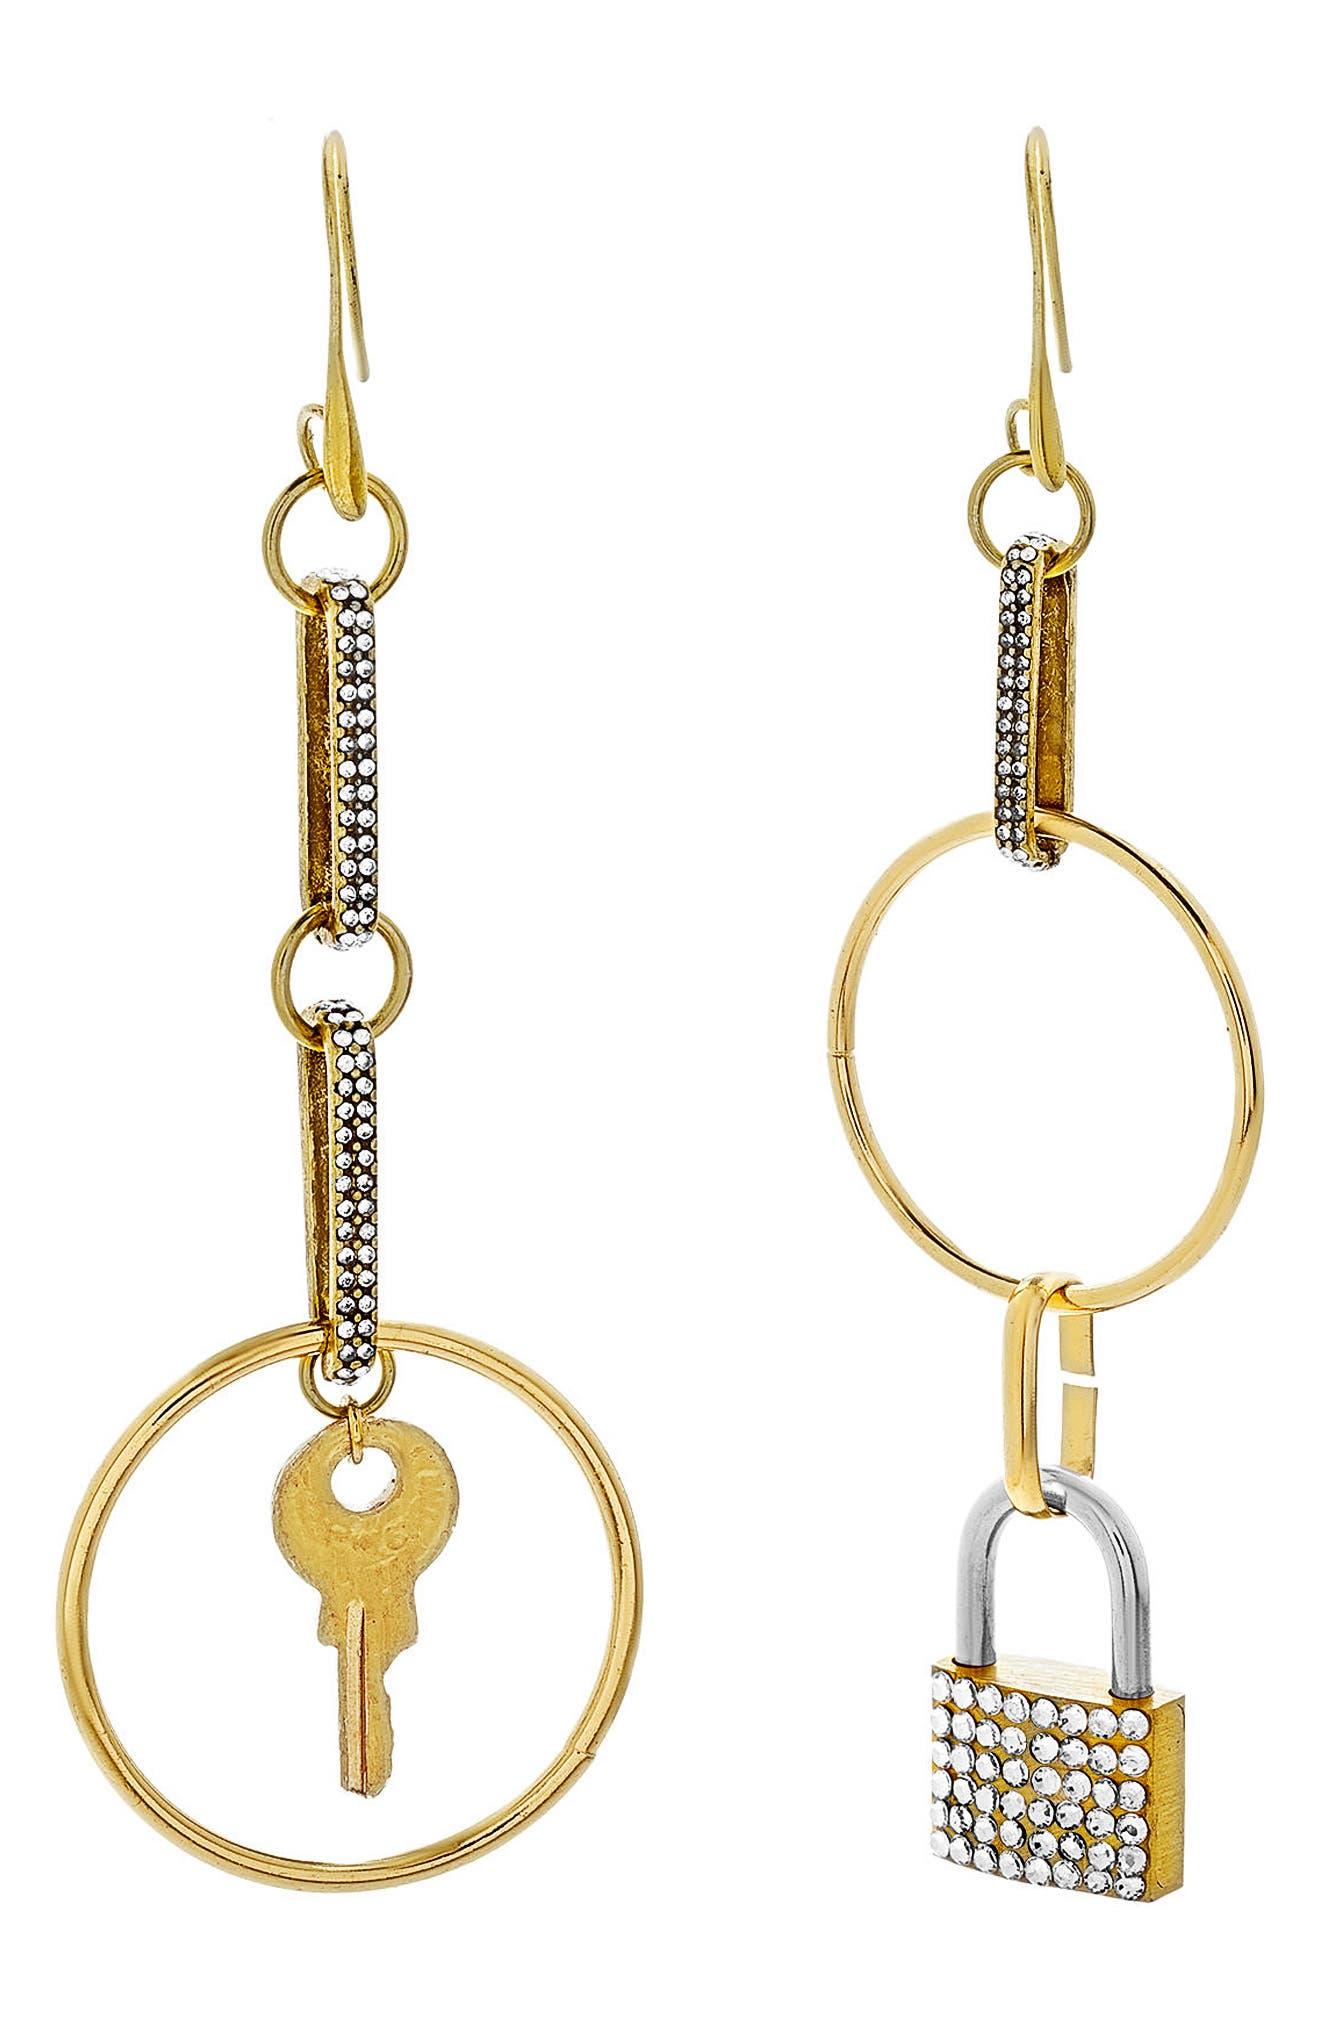 Steve Madden Key & Lock Statement Earrings